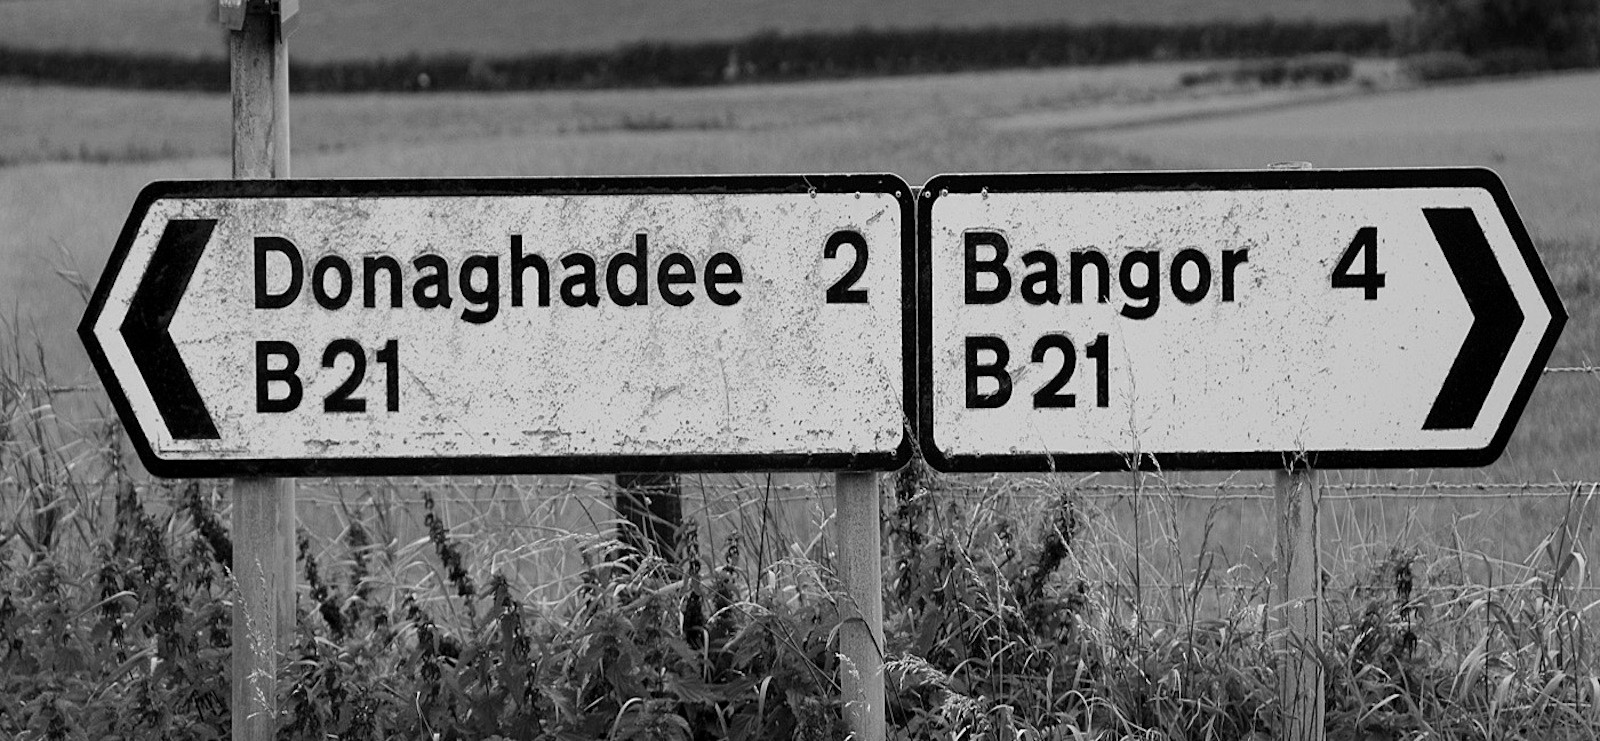 MONO - Six Miles From Bangor To Donaghadee - Richard Hayward by Paul Miller (9 marks)